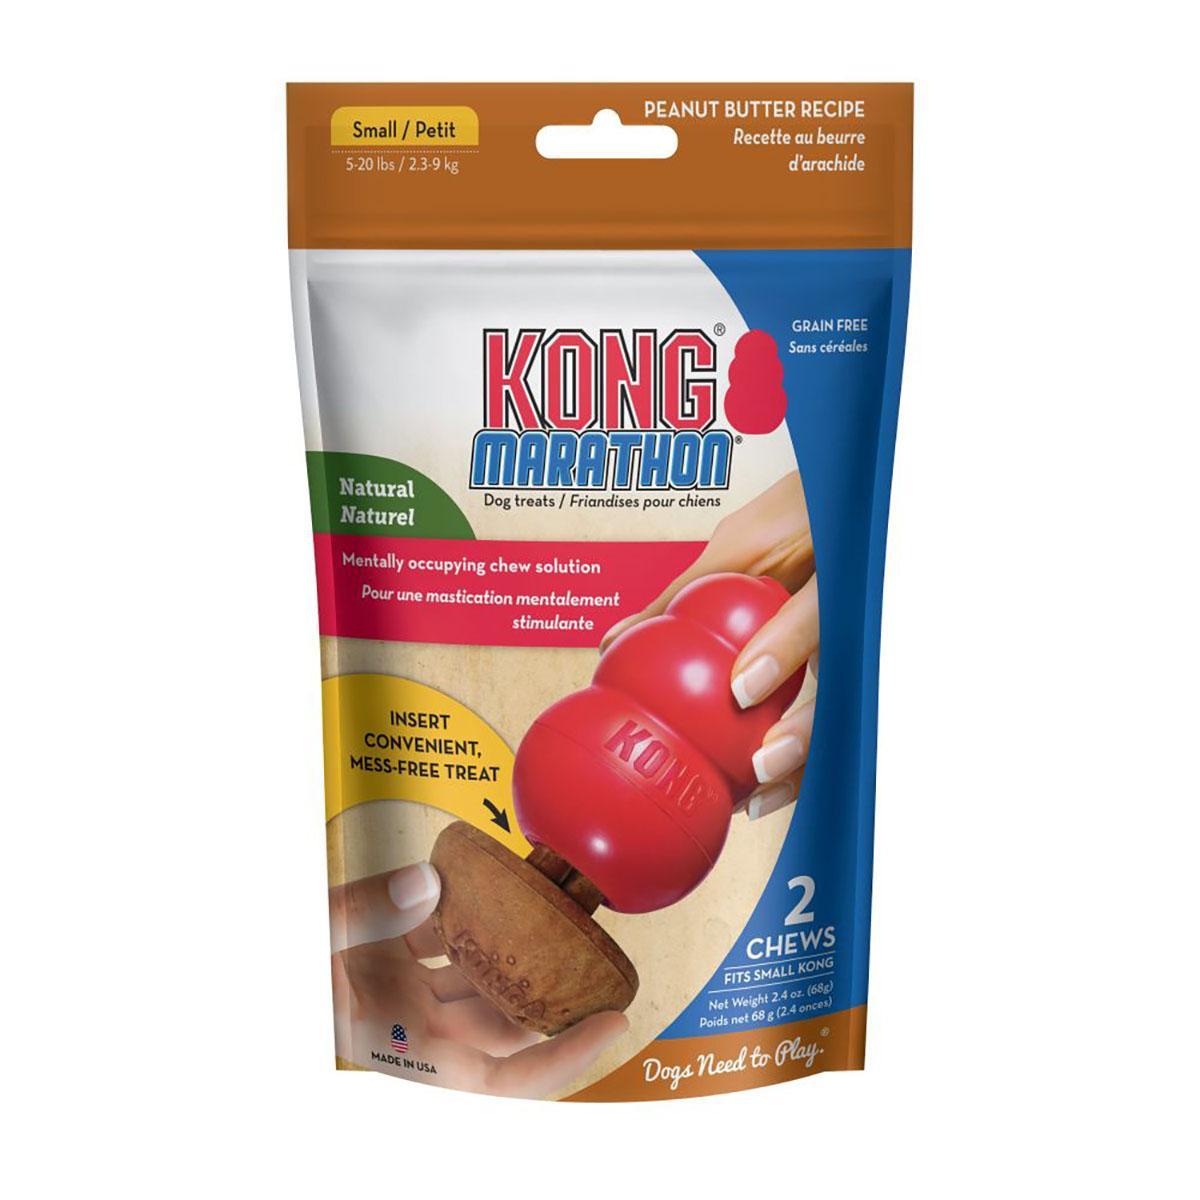 KONG Marathon® 2-pk Dog Treat - Peanut Butter